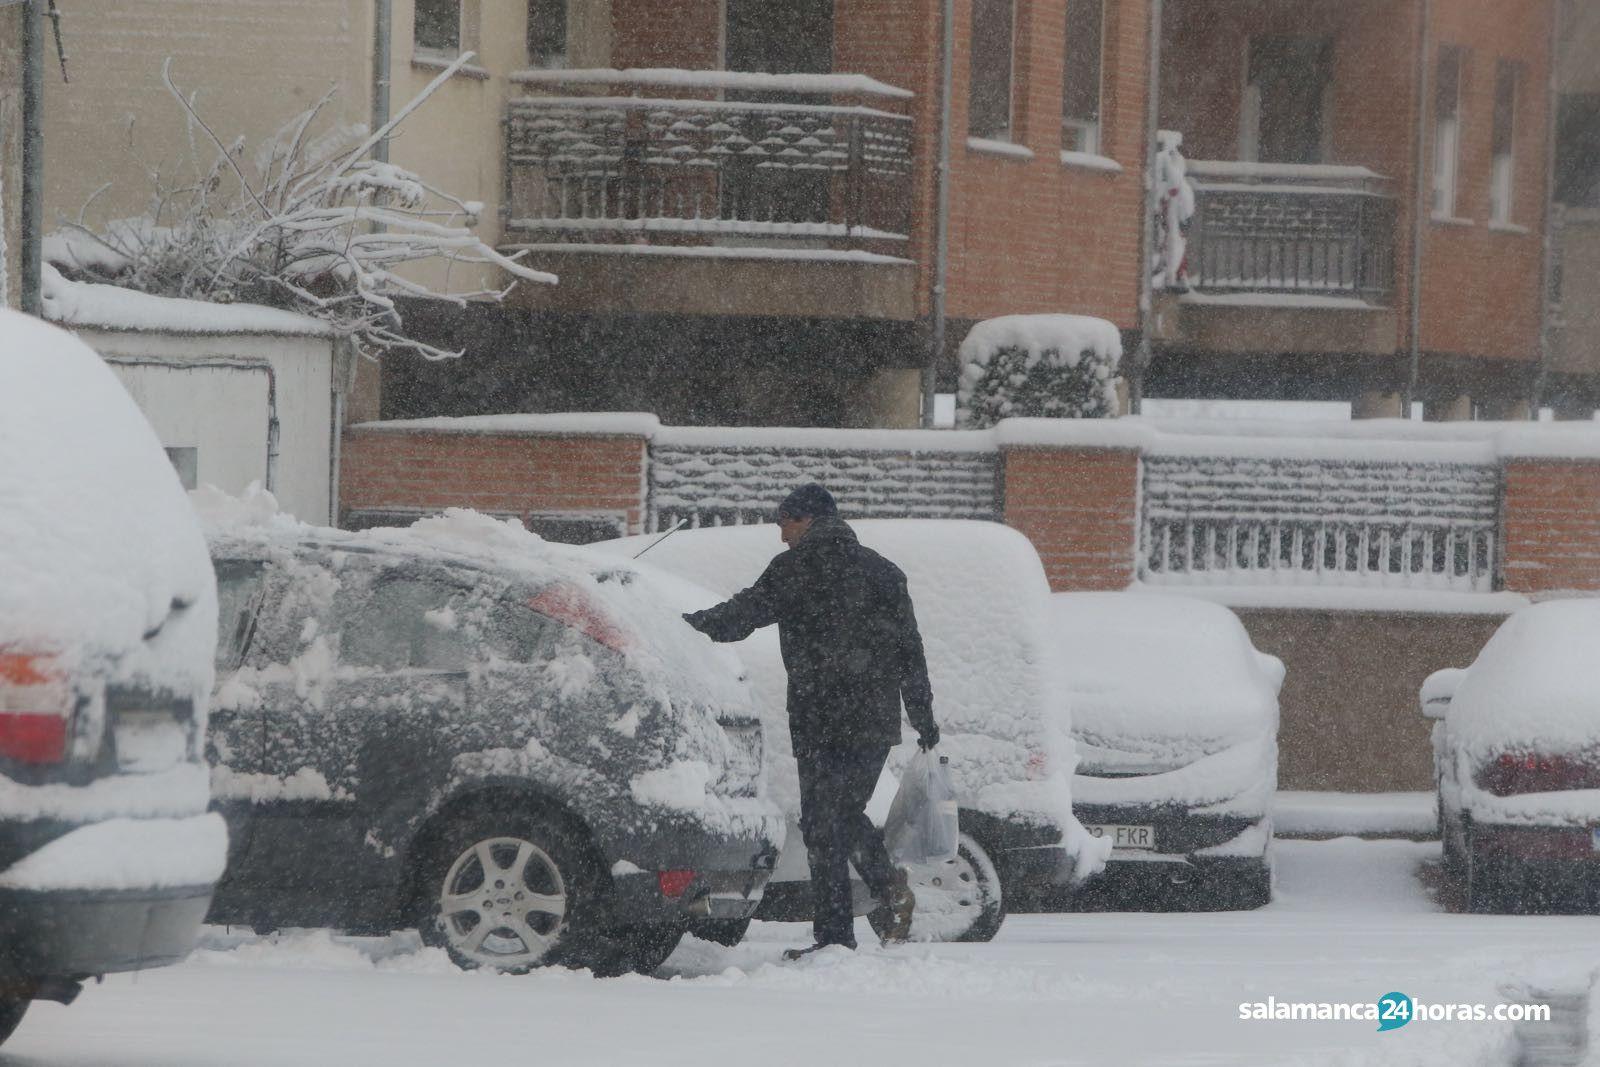 La nieve cubre guijuelo for Salamanca 24 horas